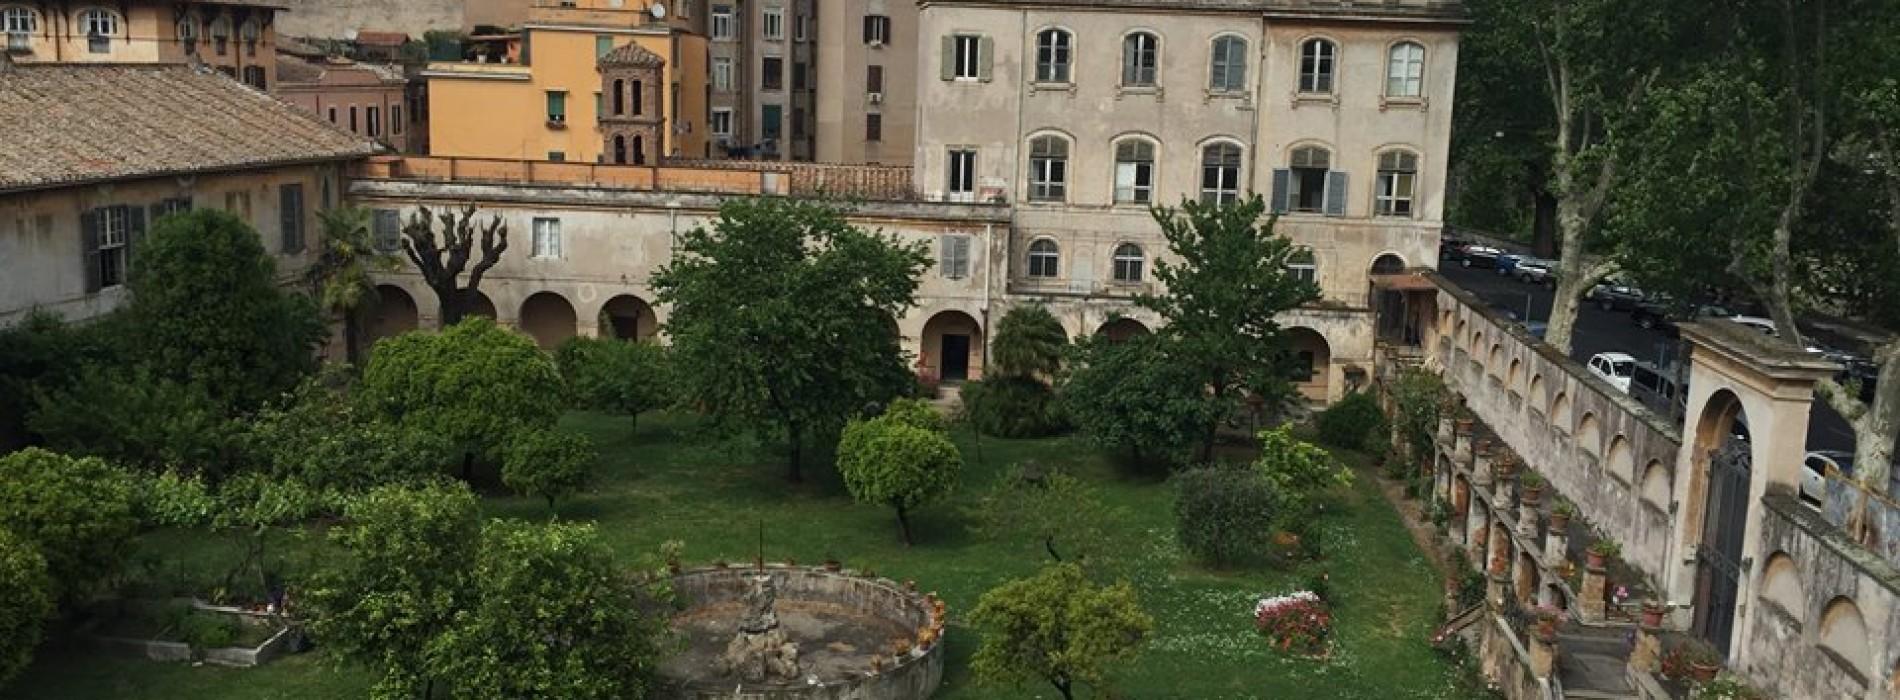 H Eitch Ripa Roma aperitivo in giardino Trastevere